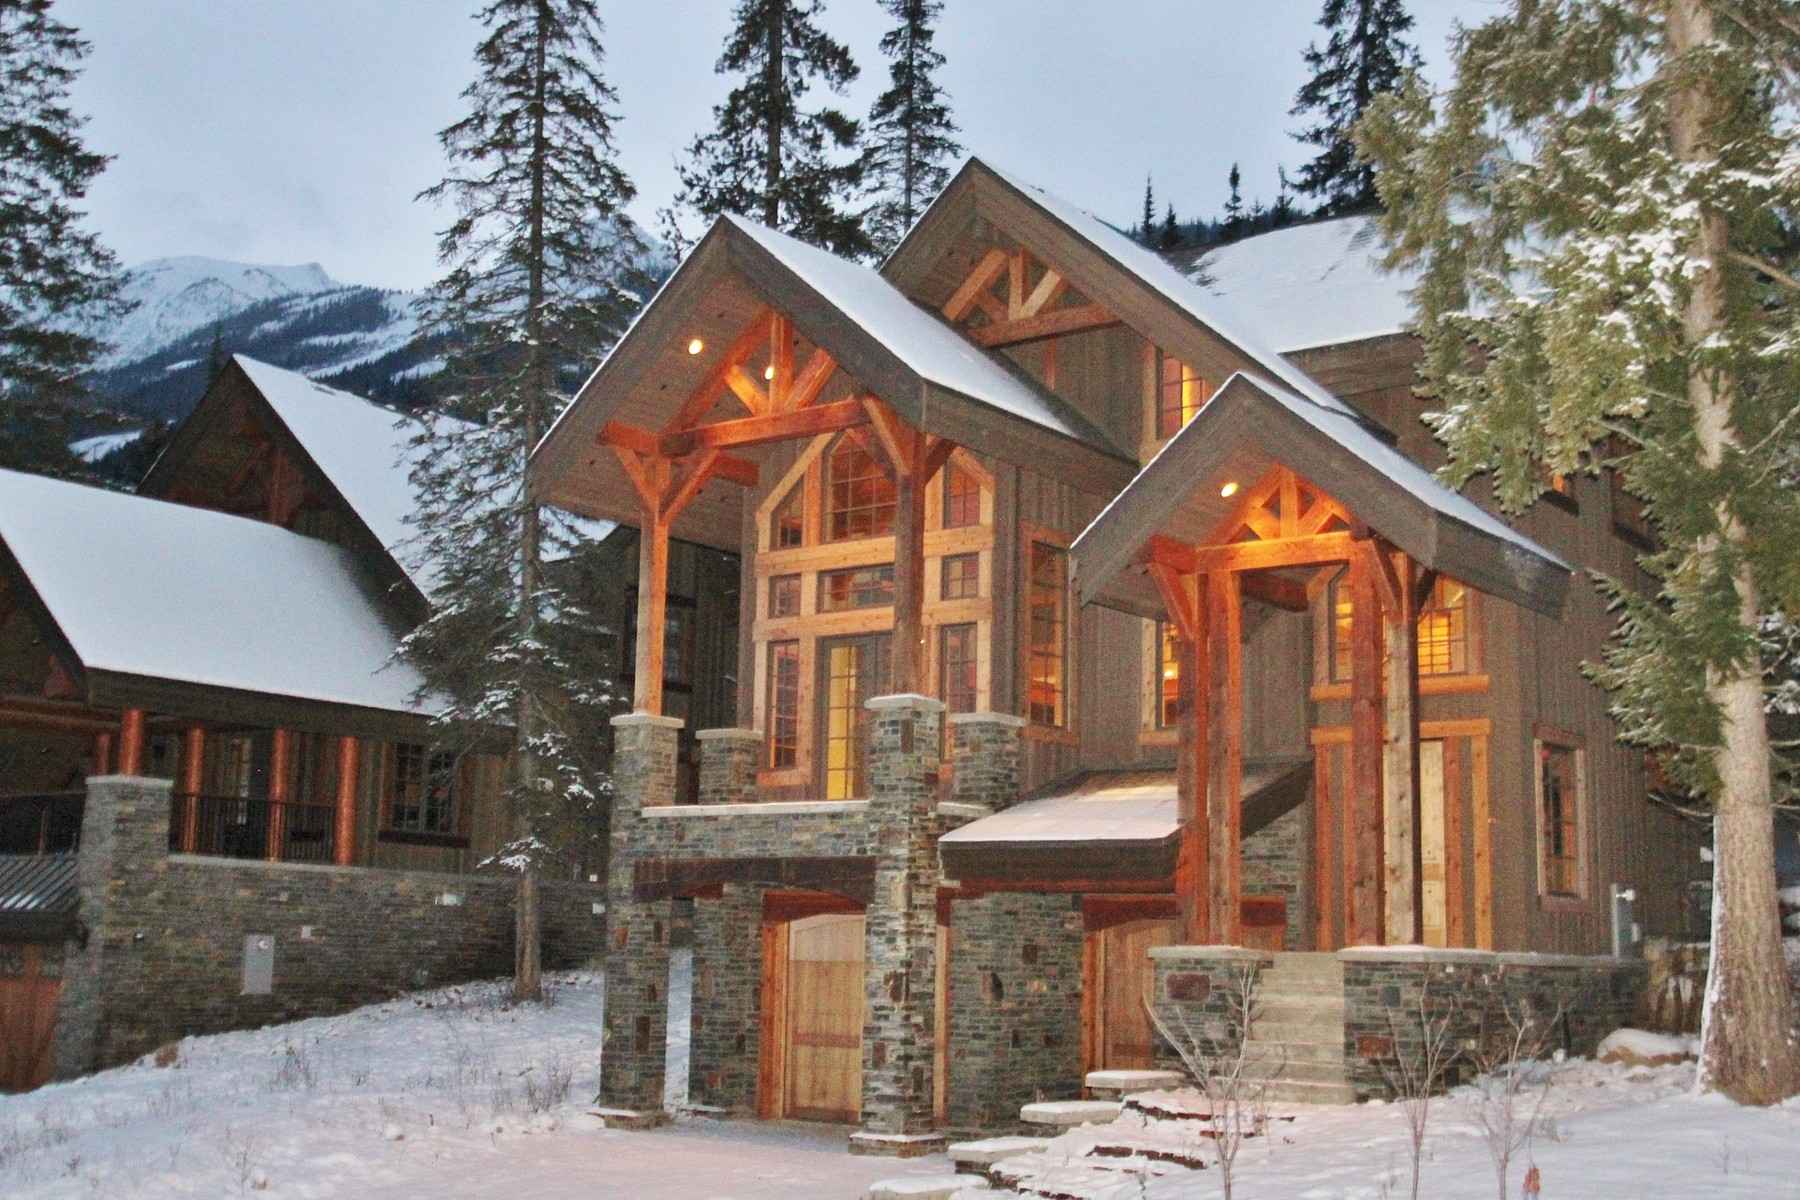 Outros residenciais para Venda às Exceptional Everything 1599 Golden Ave Golden, Columbia Britanica V0A 1H0 Canadá